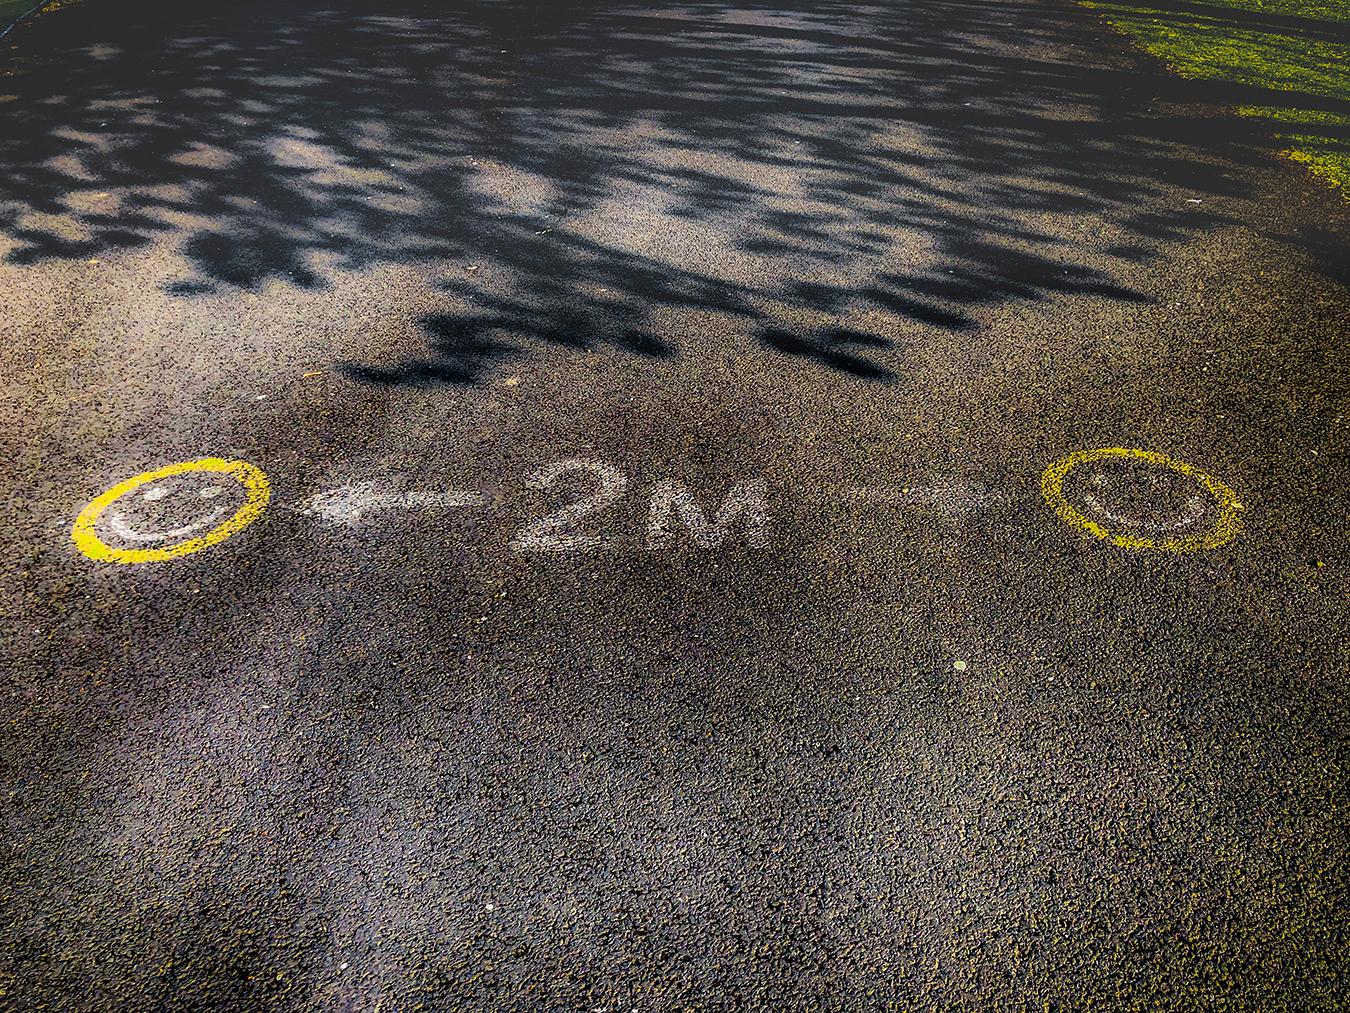 Dublin social distancing stencil, 2020. Photo by Thomas Strong.